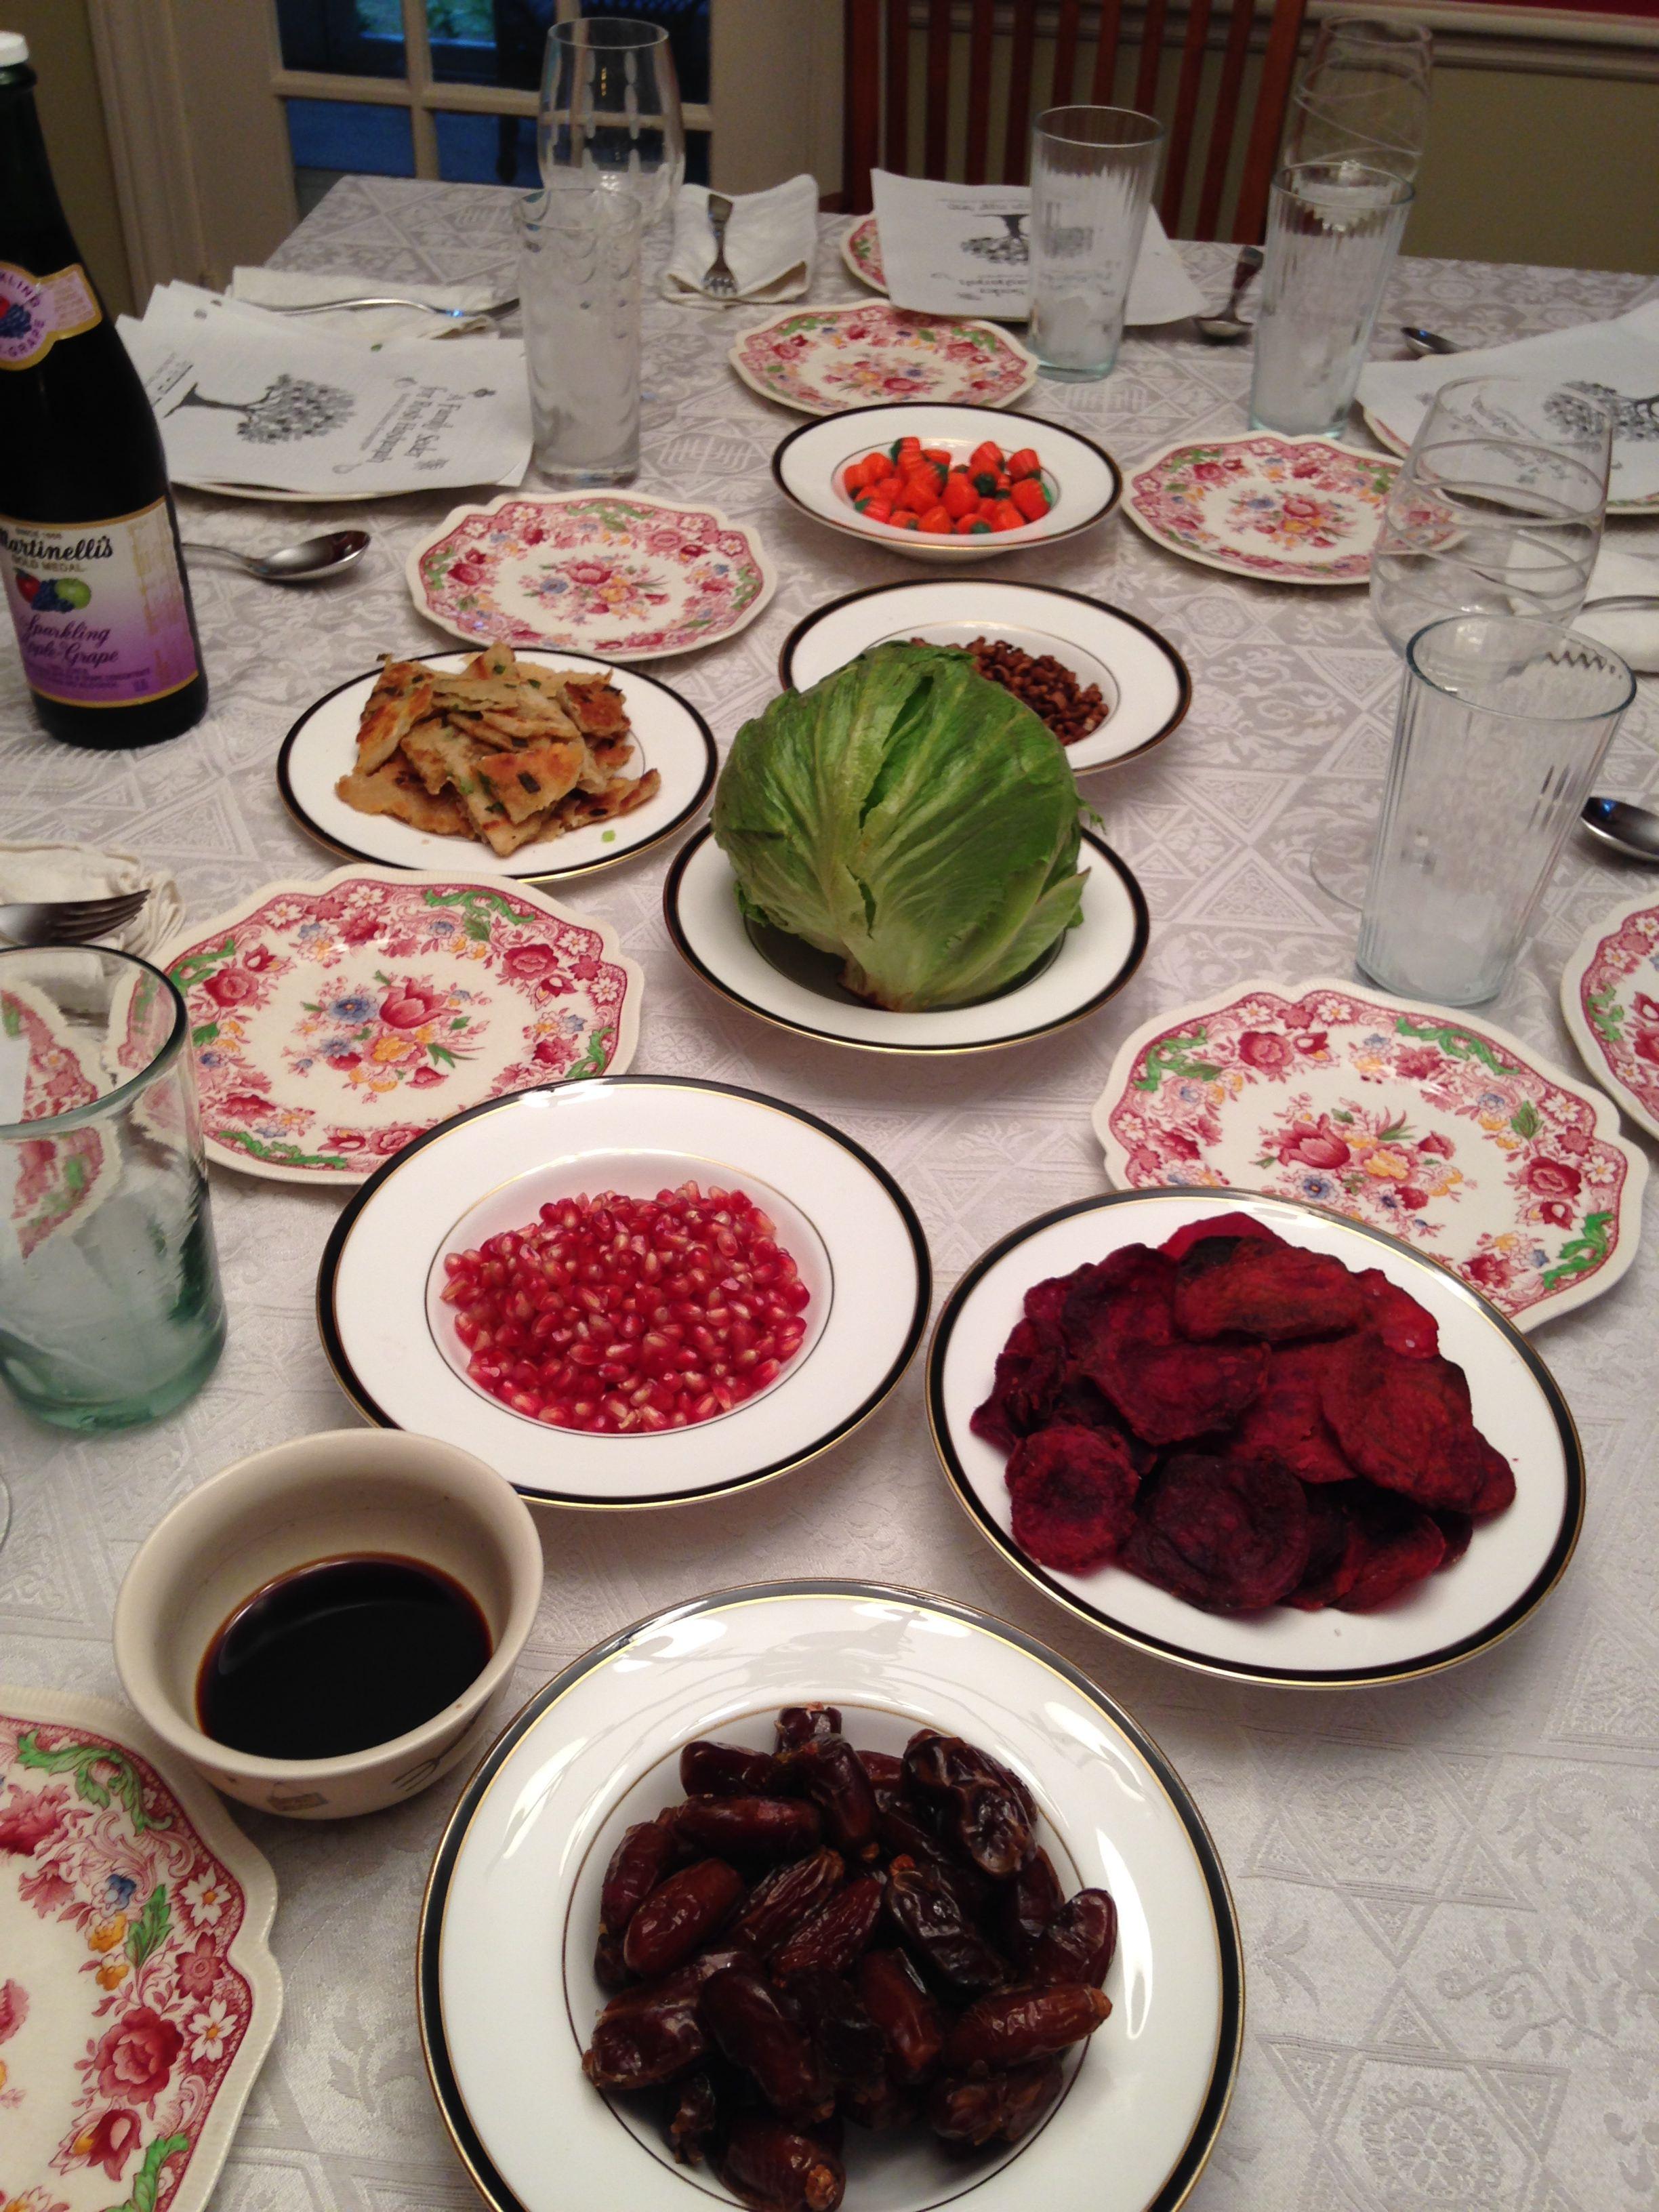 Our First Rosh Hashanah Seder Interfaithfamily